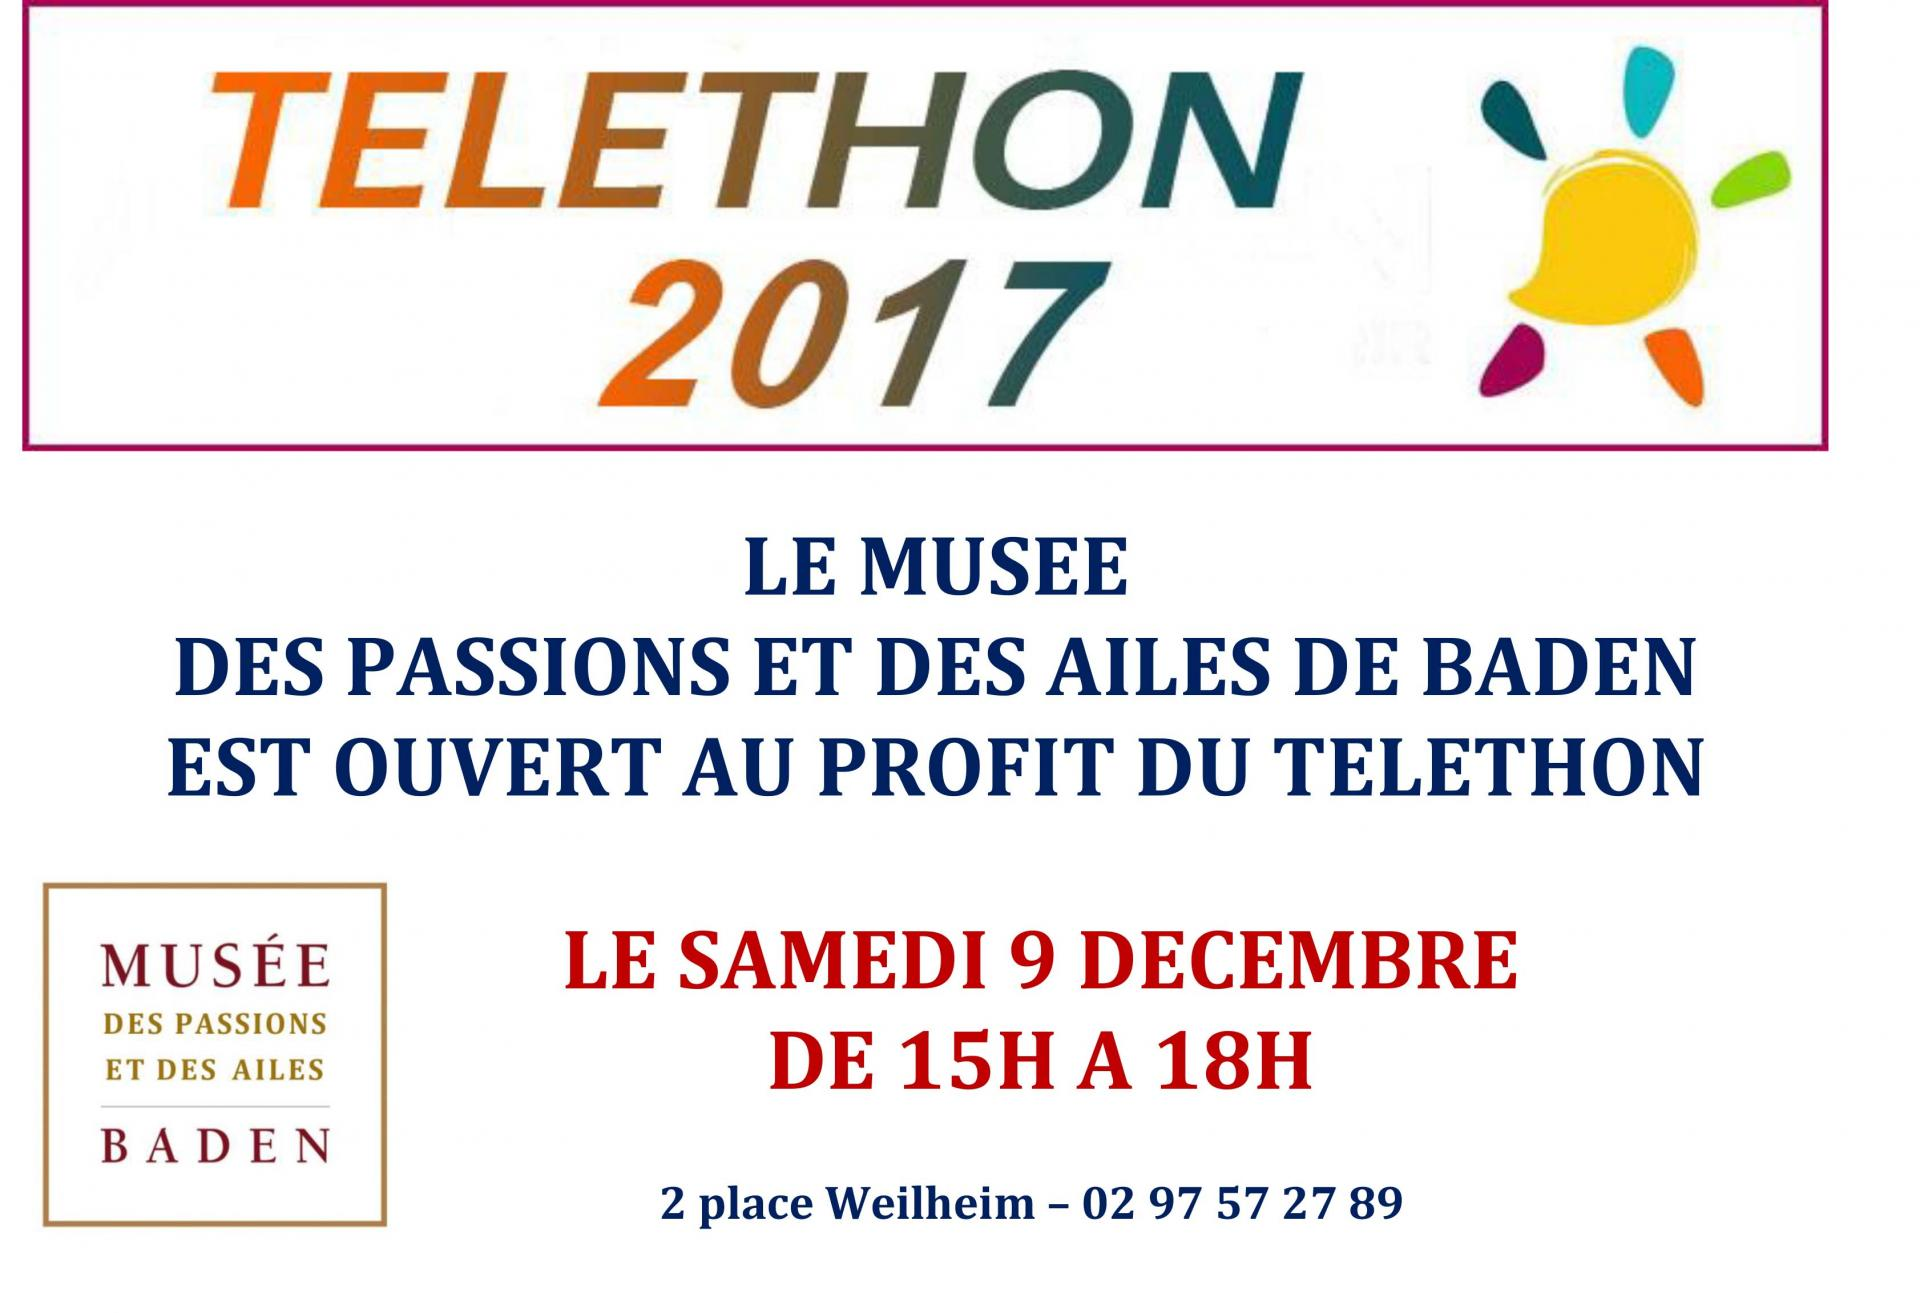 Musee telethon